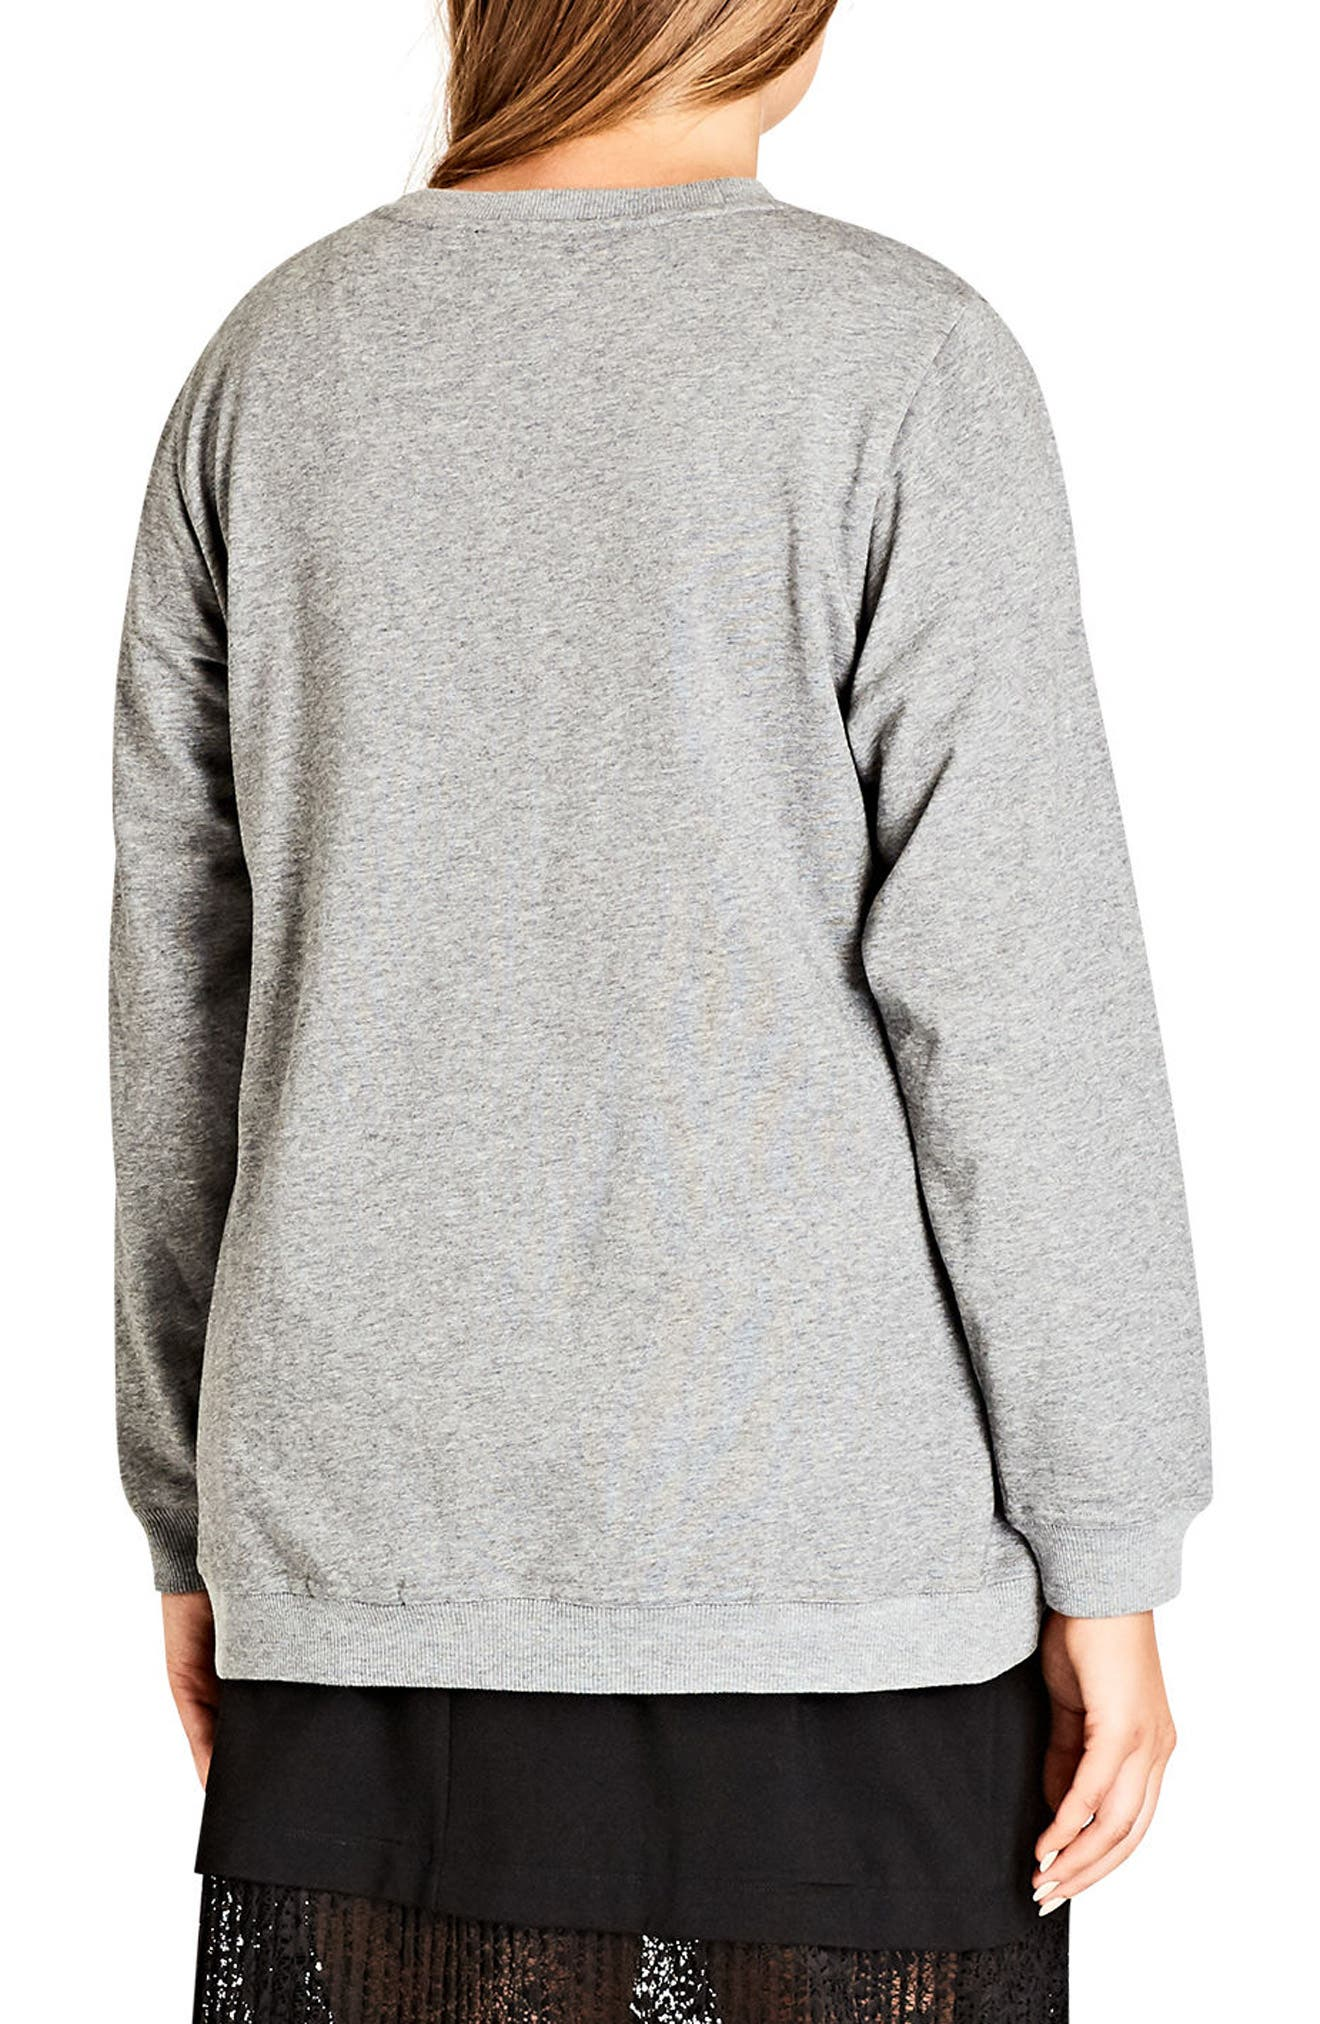 Vibes Glitter Graphic Sweatshirt,                             Alternate thumbnail 2, color,                             Grey Marle